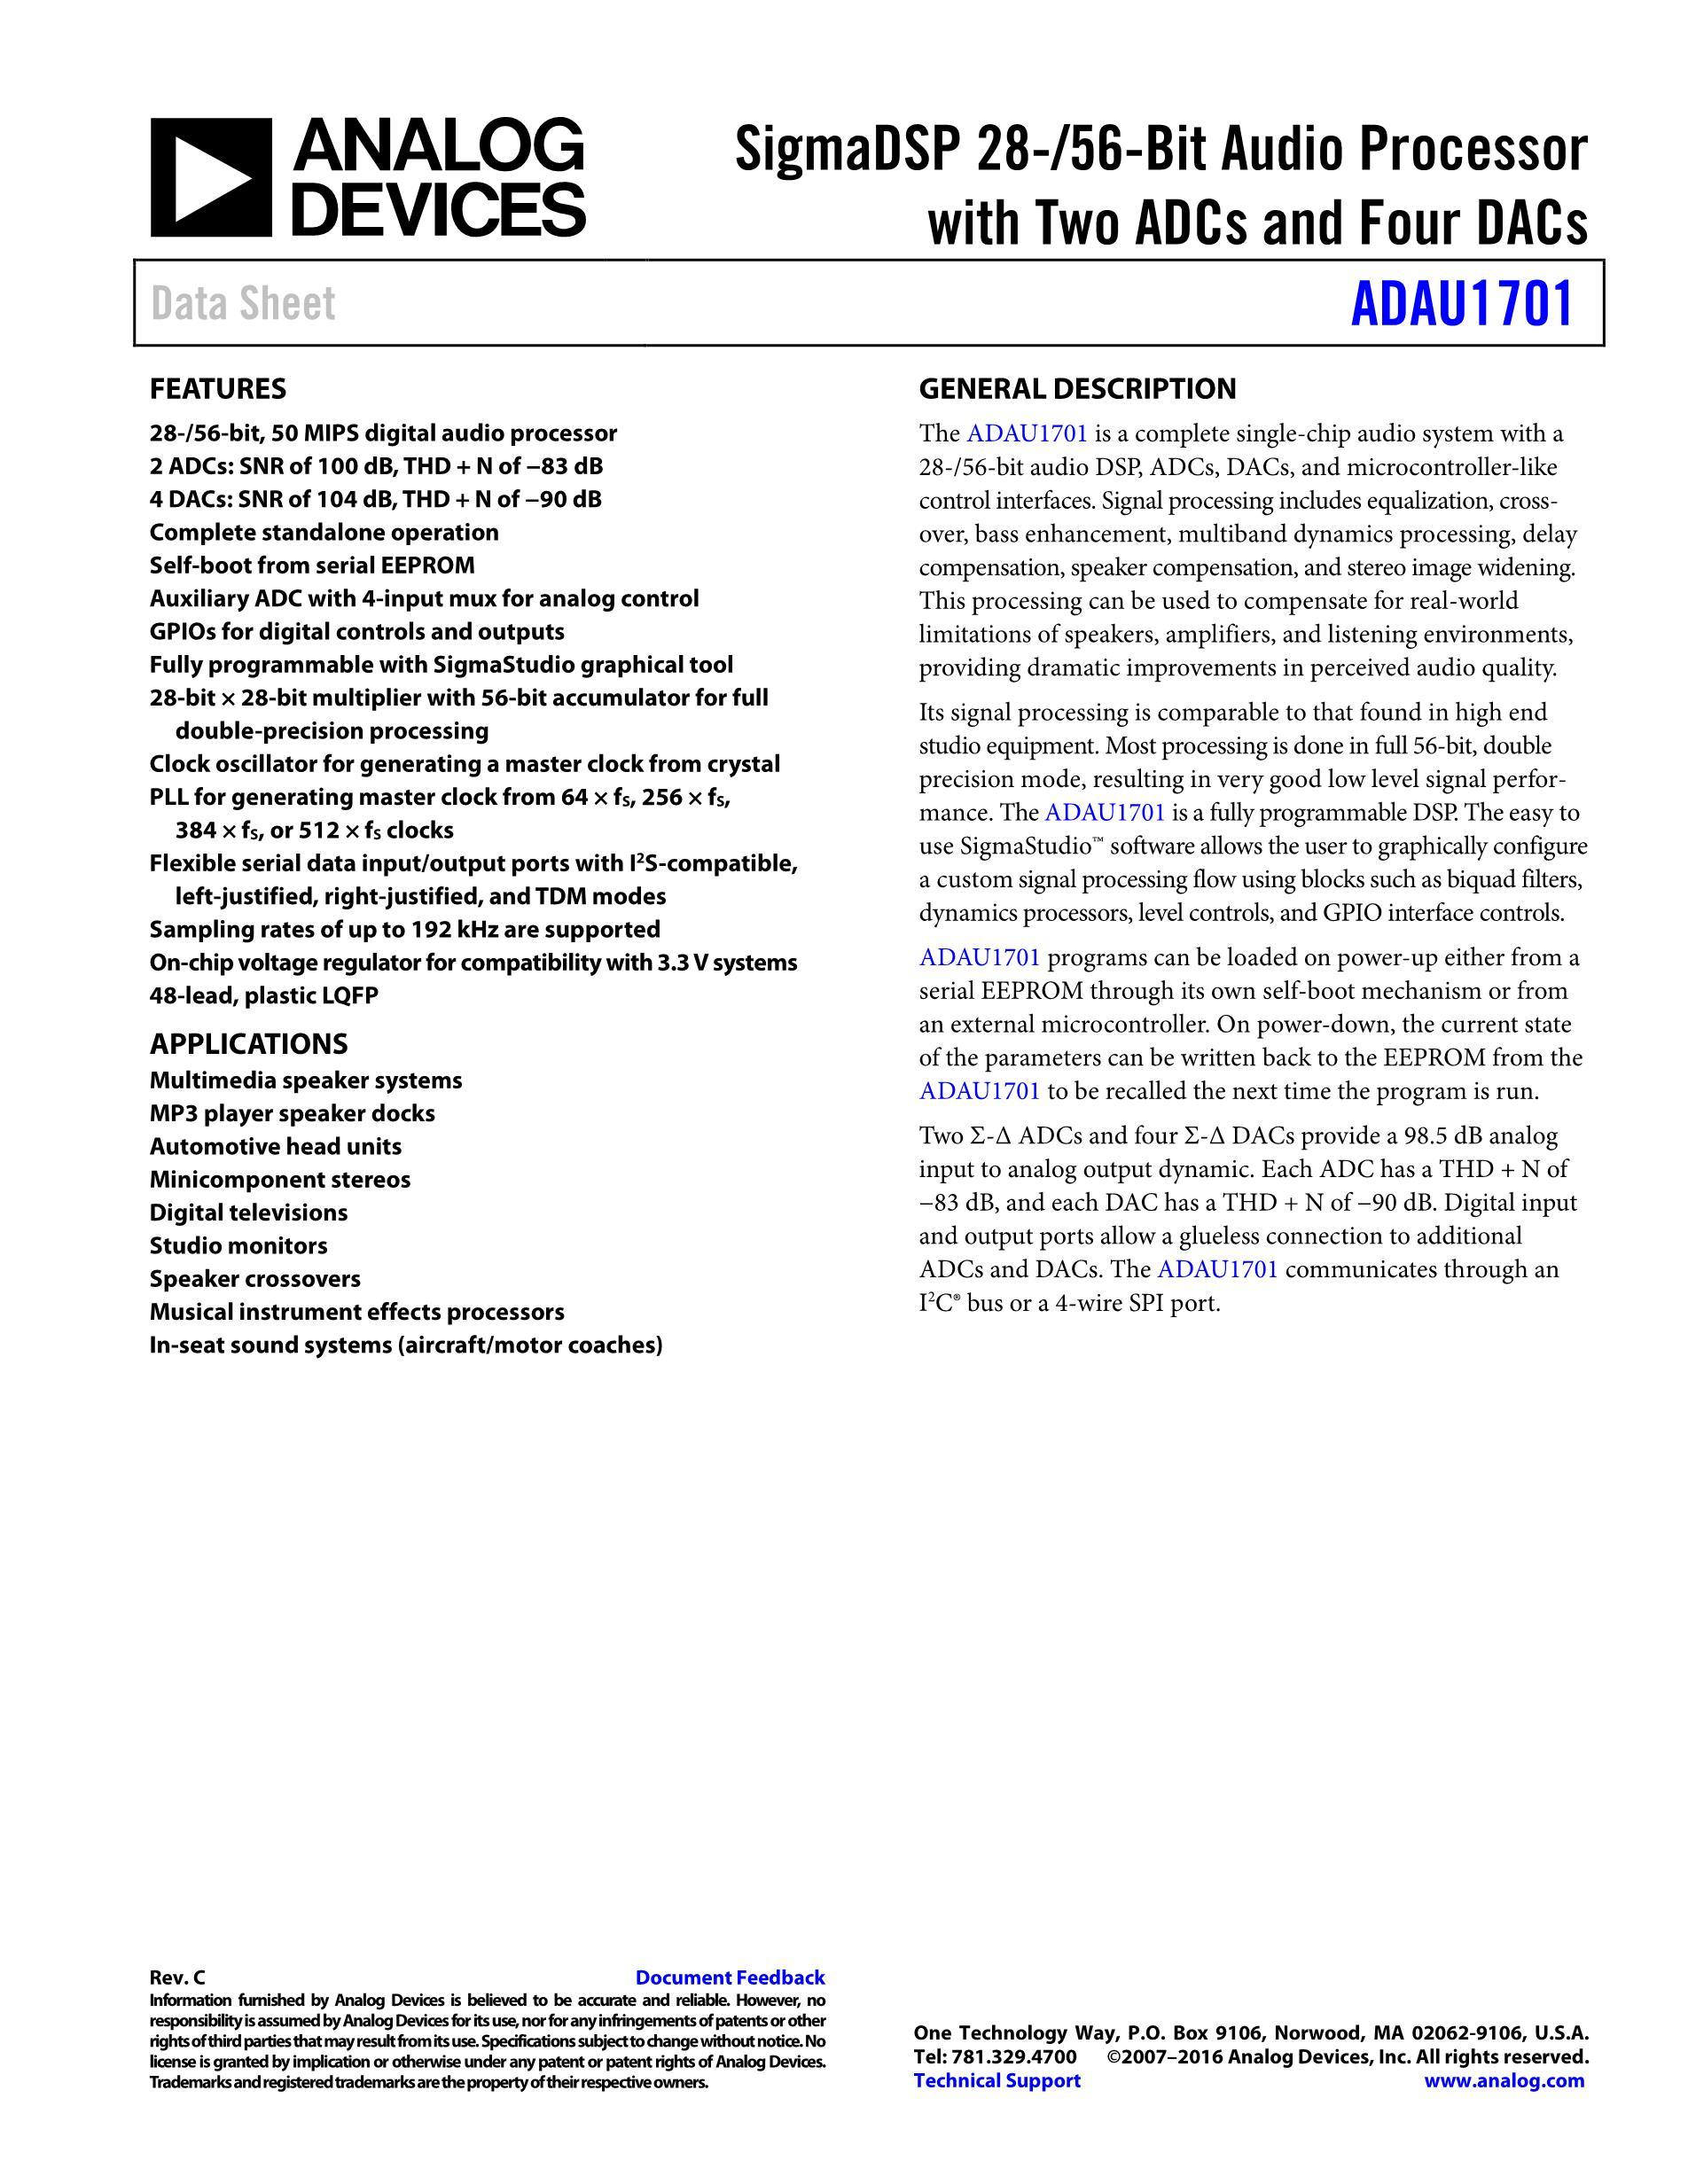 ADAU1328BSTZ's pdf picture 1